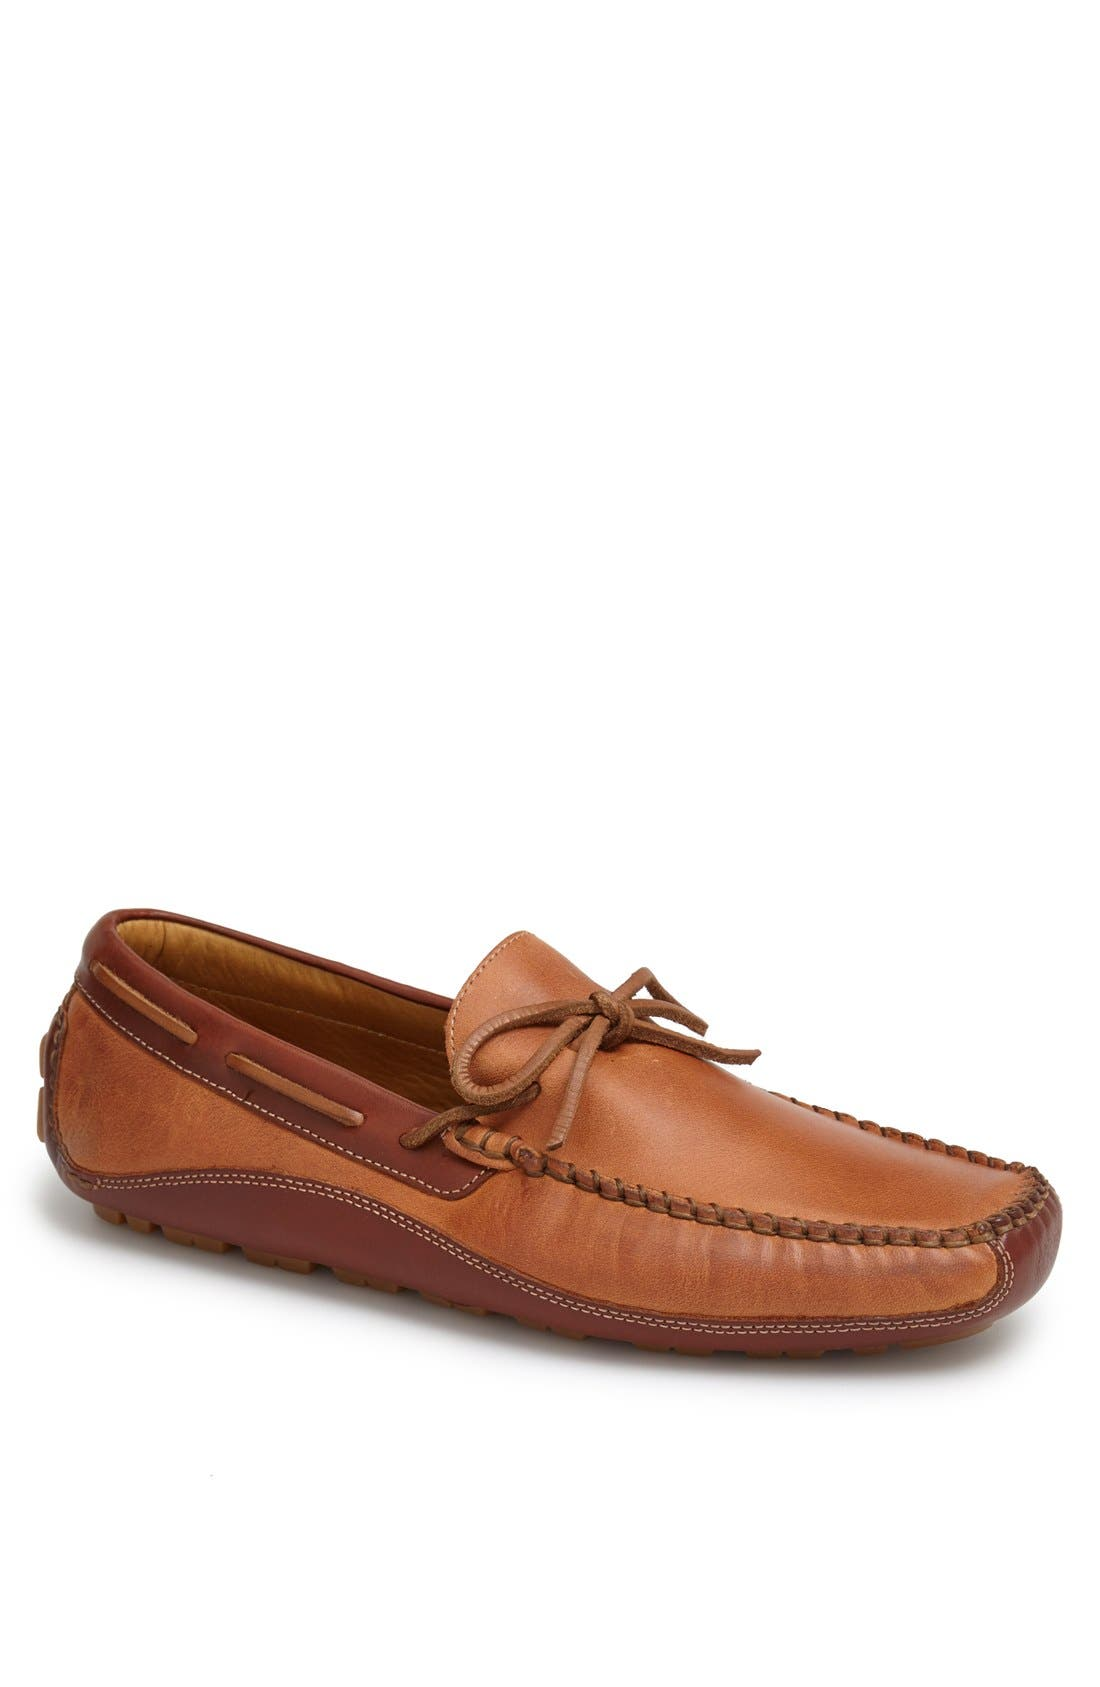 'Drake' Leather Driving Shoe,                             Main thumbnail 8, color,